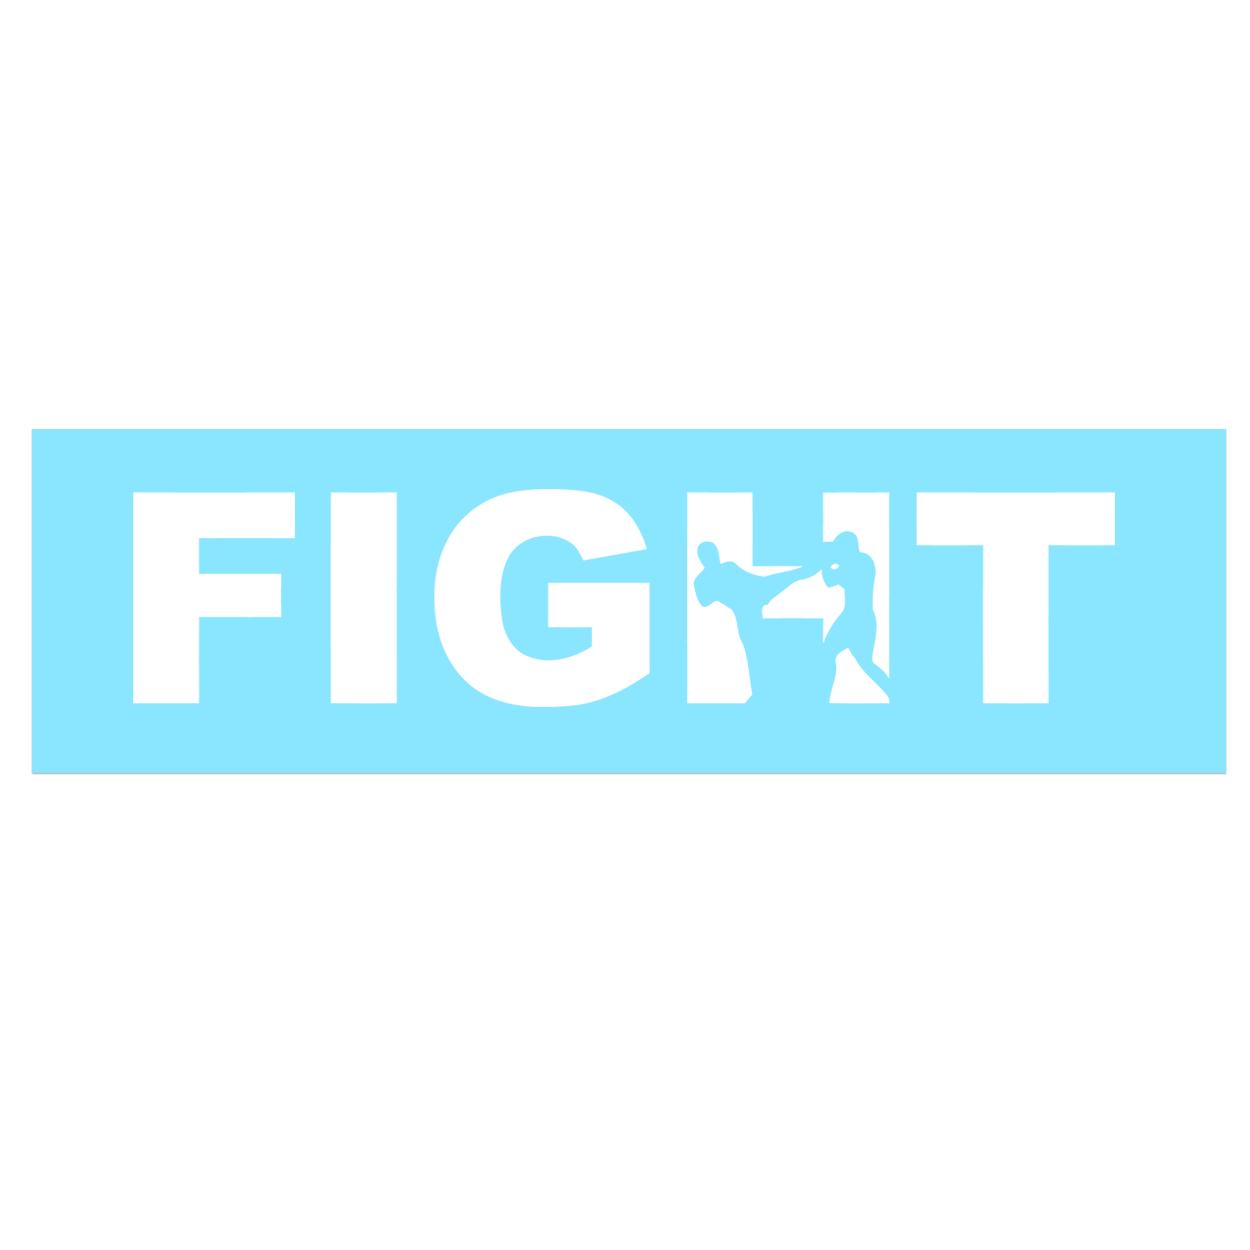 Fight Kick Logo Classic Decal (White Logo)